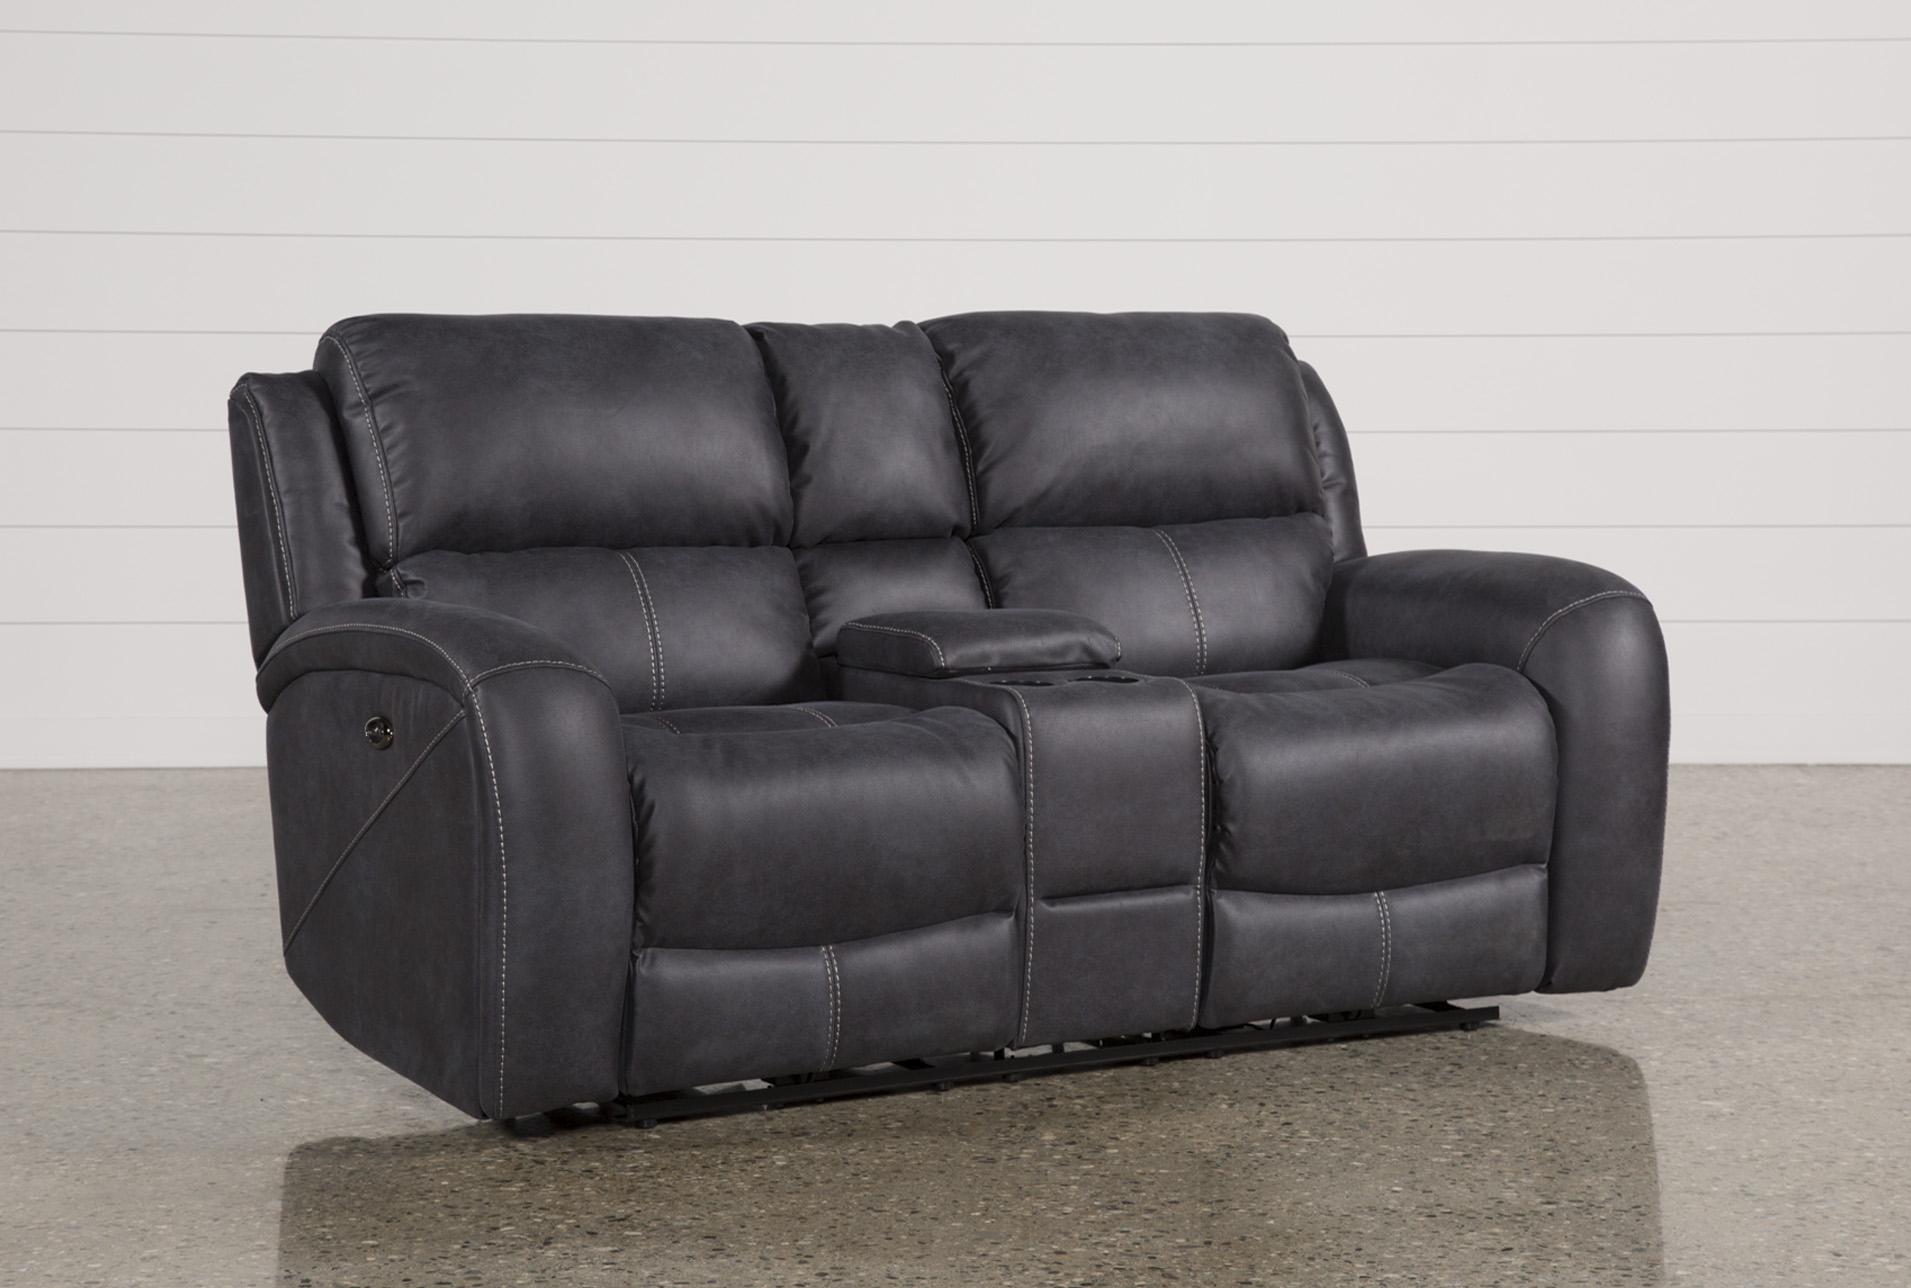 leather sofa bed near me standard sizes australia deegan charcoal power reclining loveseat w console